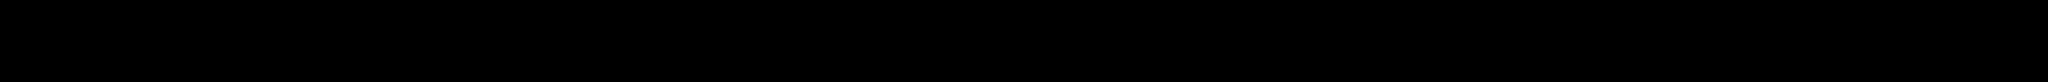 BILSTEIN VNE-4681, MR 102433, MR 102434, MR 102439, MR 102440 Ammortizzatore